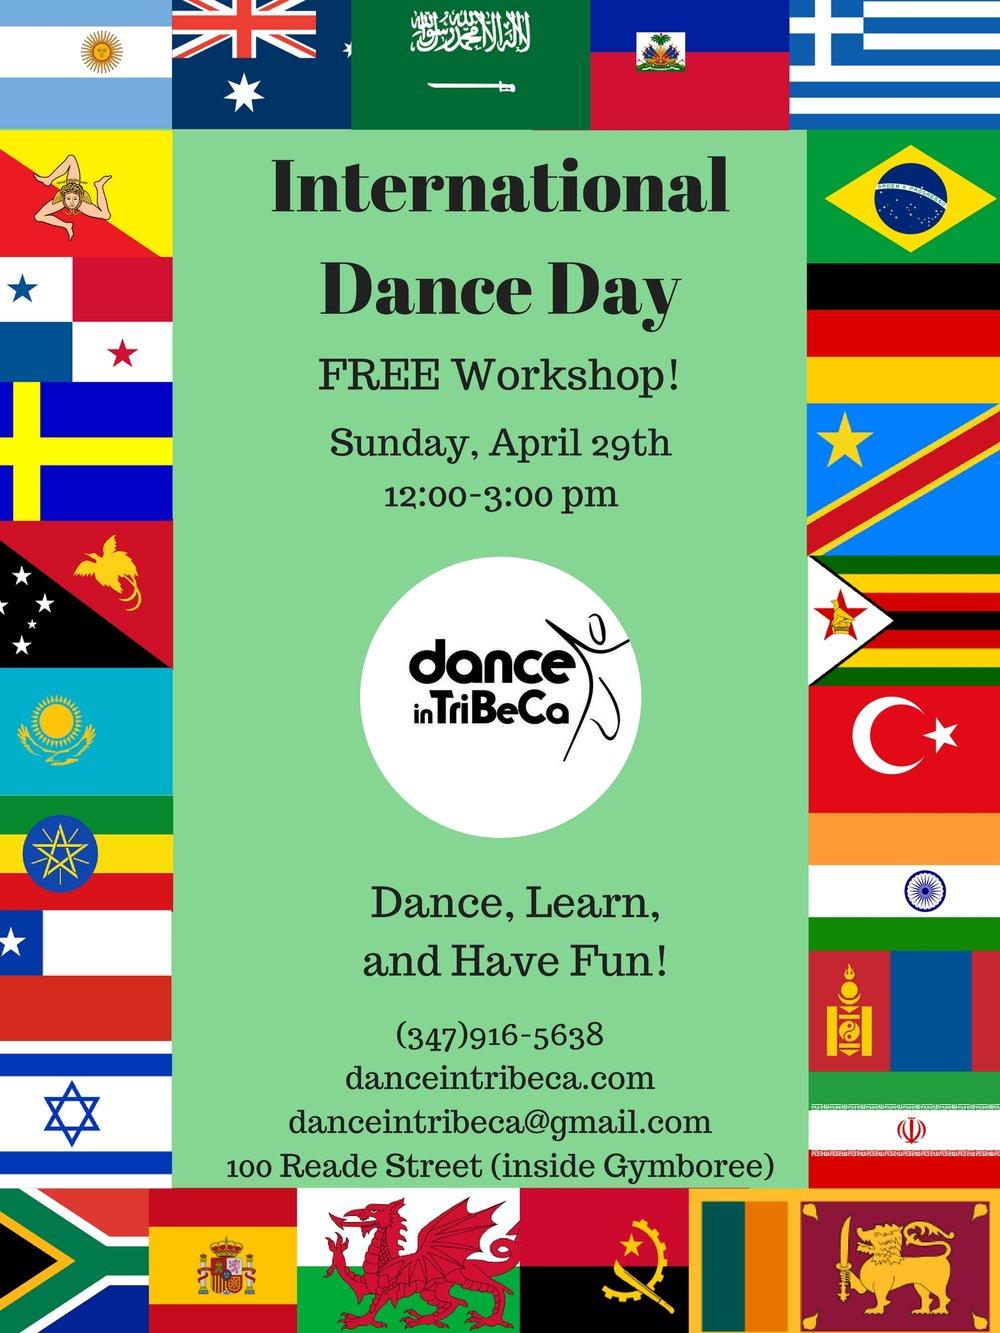 Int. Dance Day Flyer.jpg